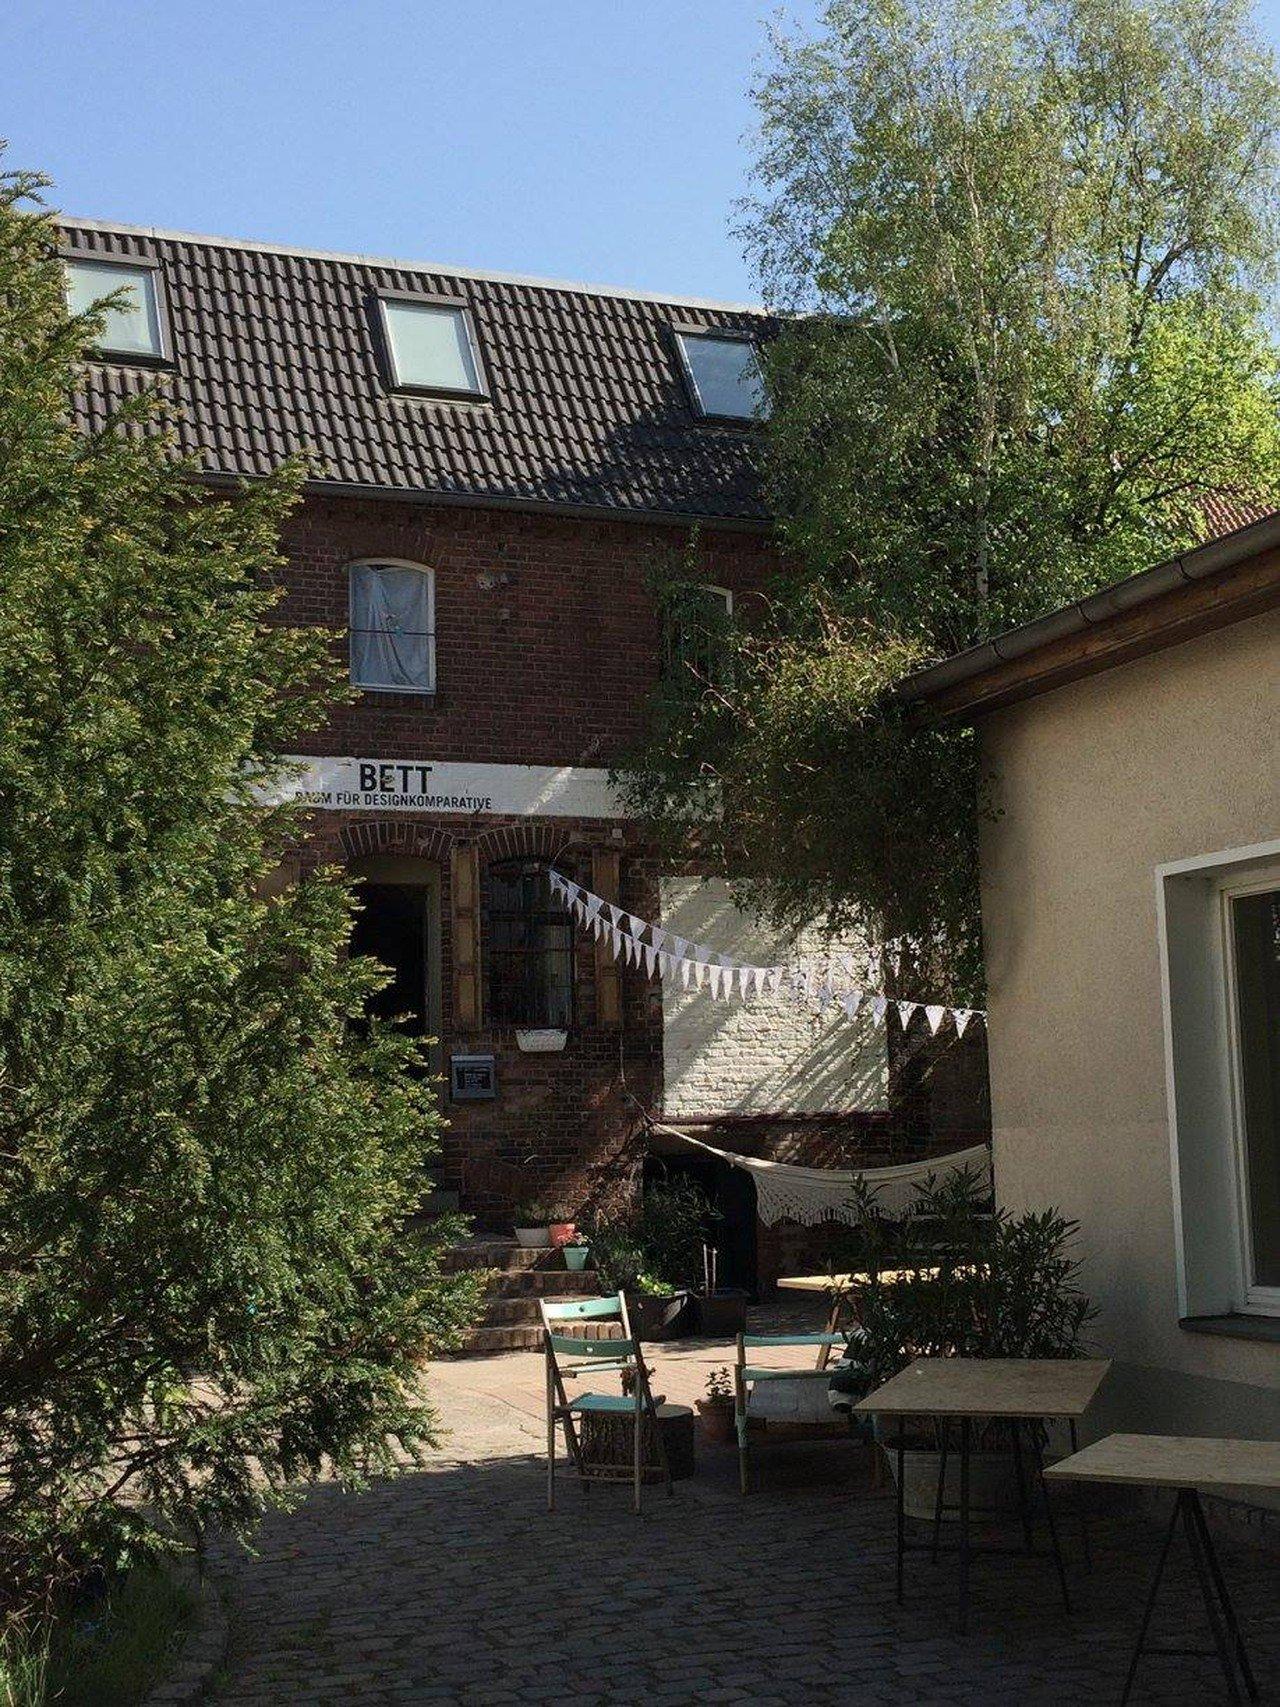 bett coworking mieten in berlin. Black Bedroom Furniture Sets. Home Design Ideas